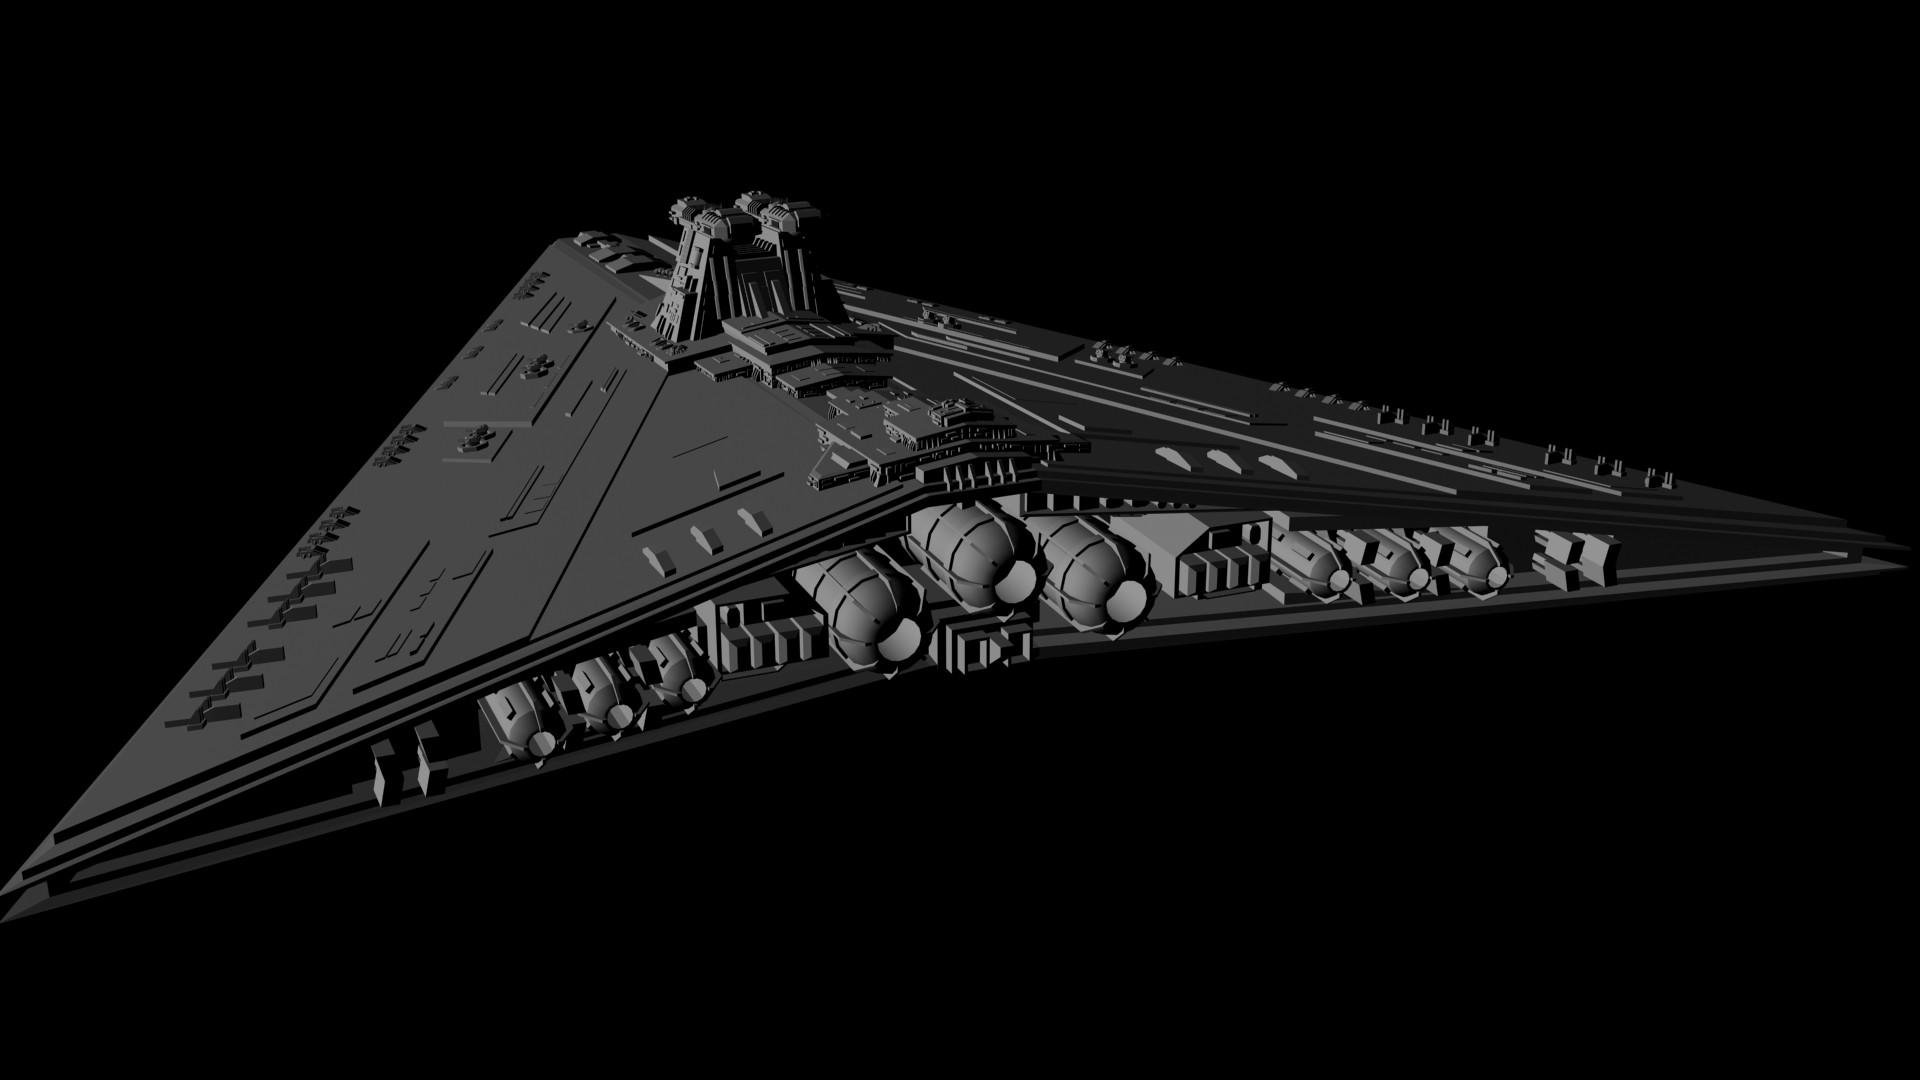 130 Imperial Star Destroyer Wallpaper Hd